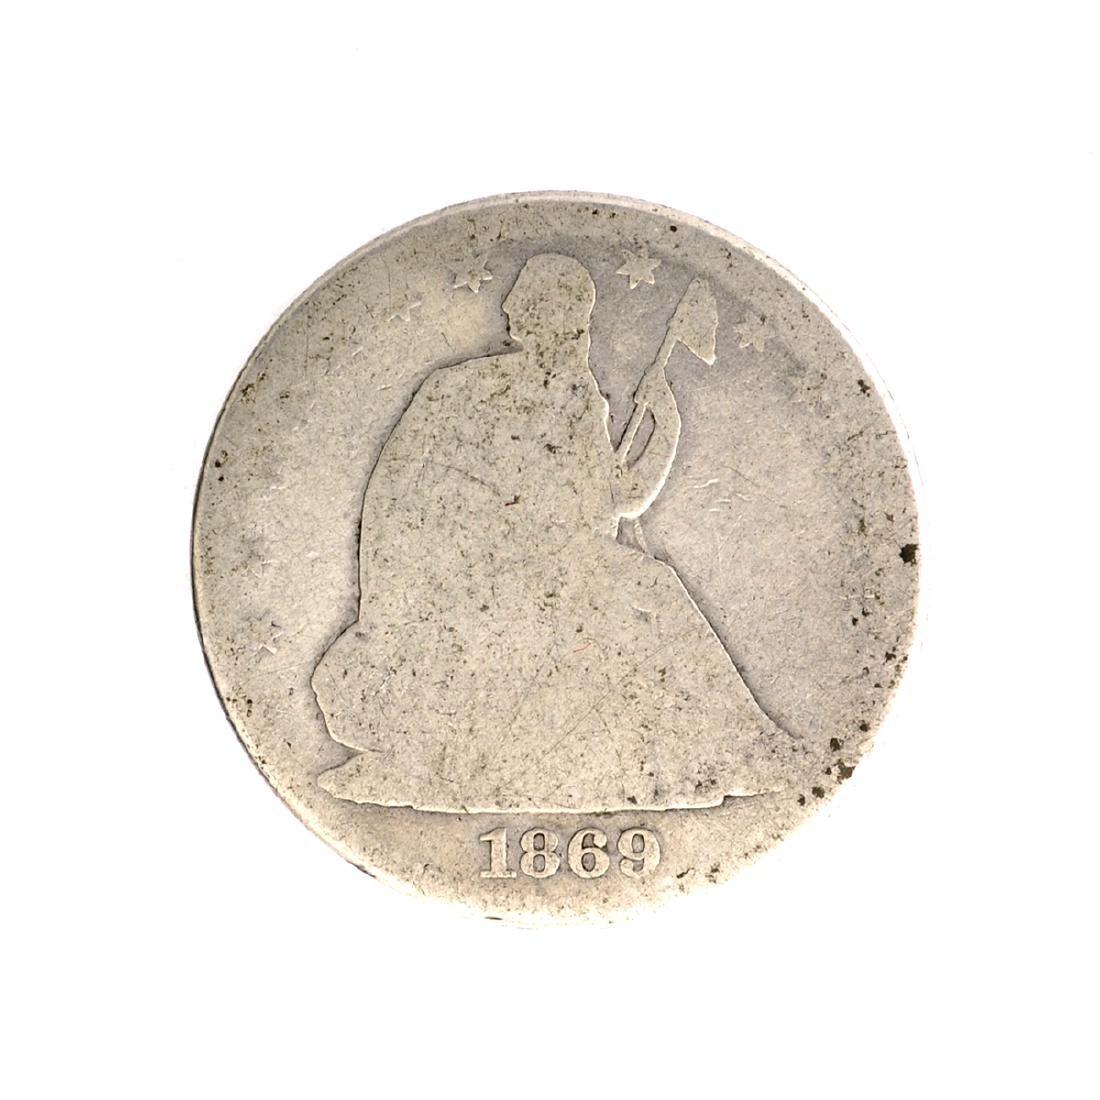 1869 Liberty Seated Half Dollar Coin